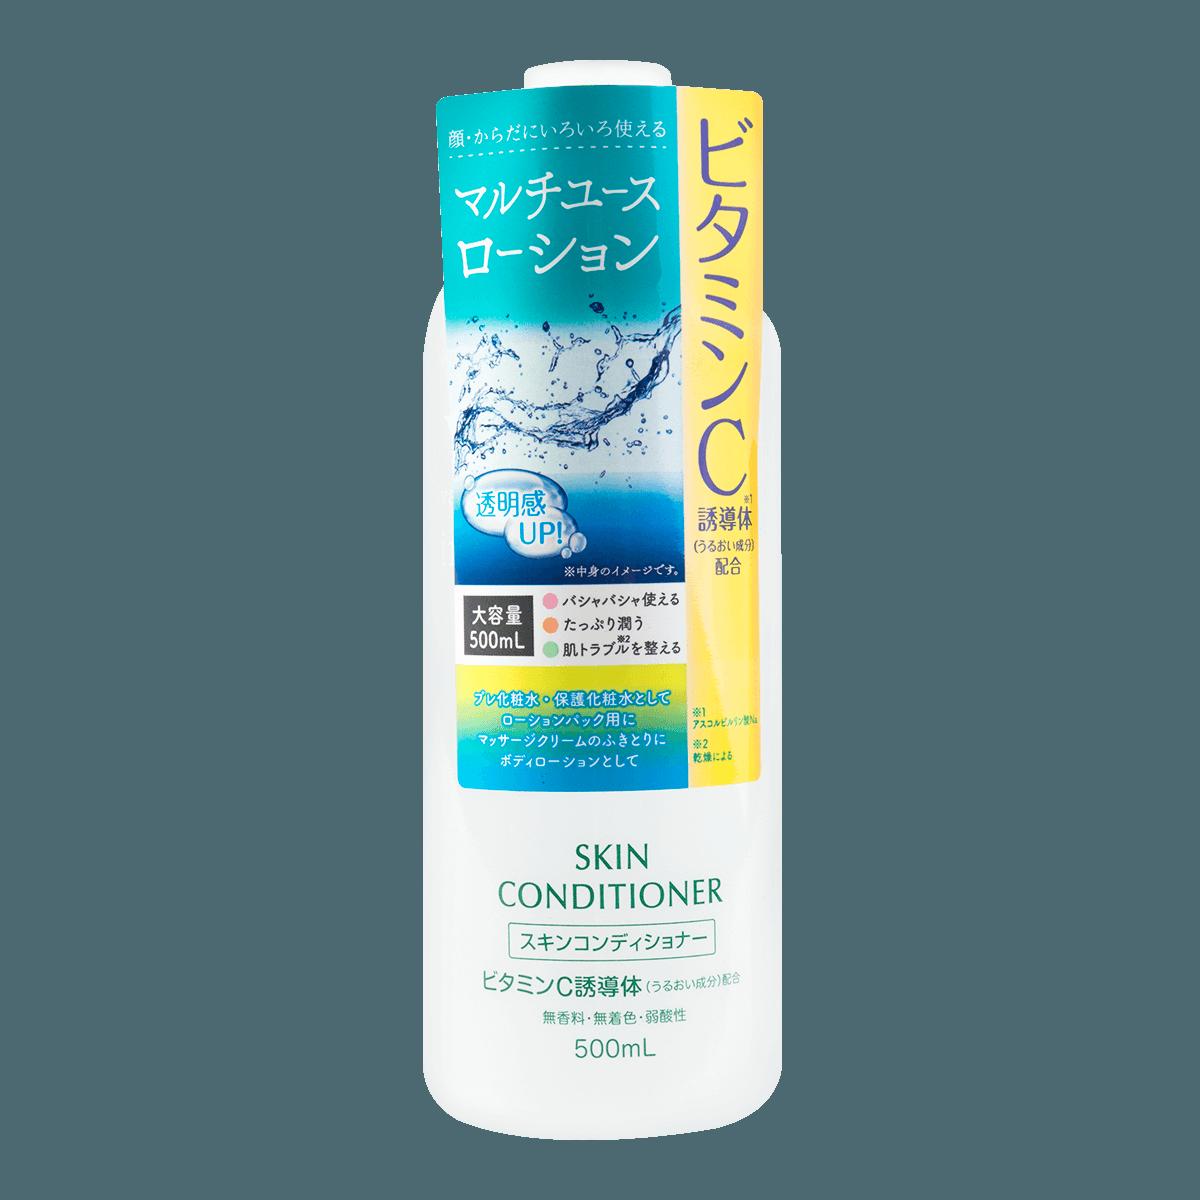 Yamibuycom Skin Toner Club Hatomugi Conditioner 500ml Naris Up Cosmetics Facial Lotion Vitamin C